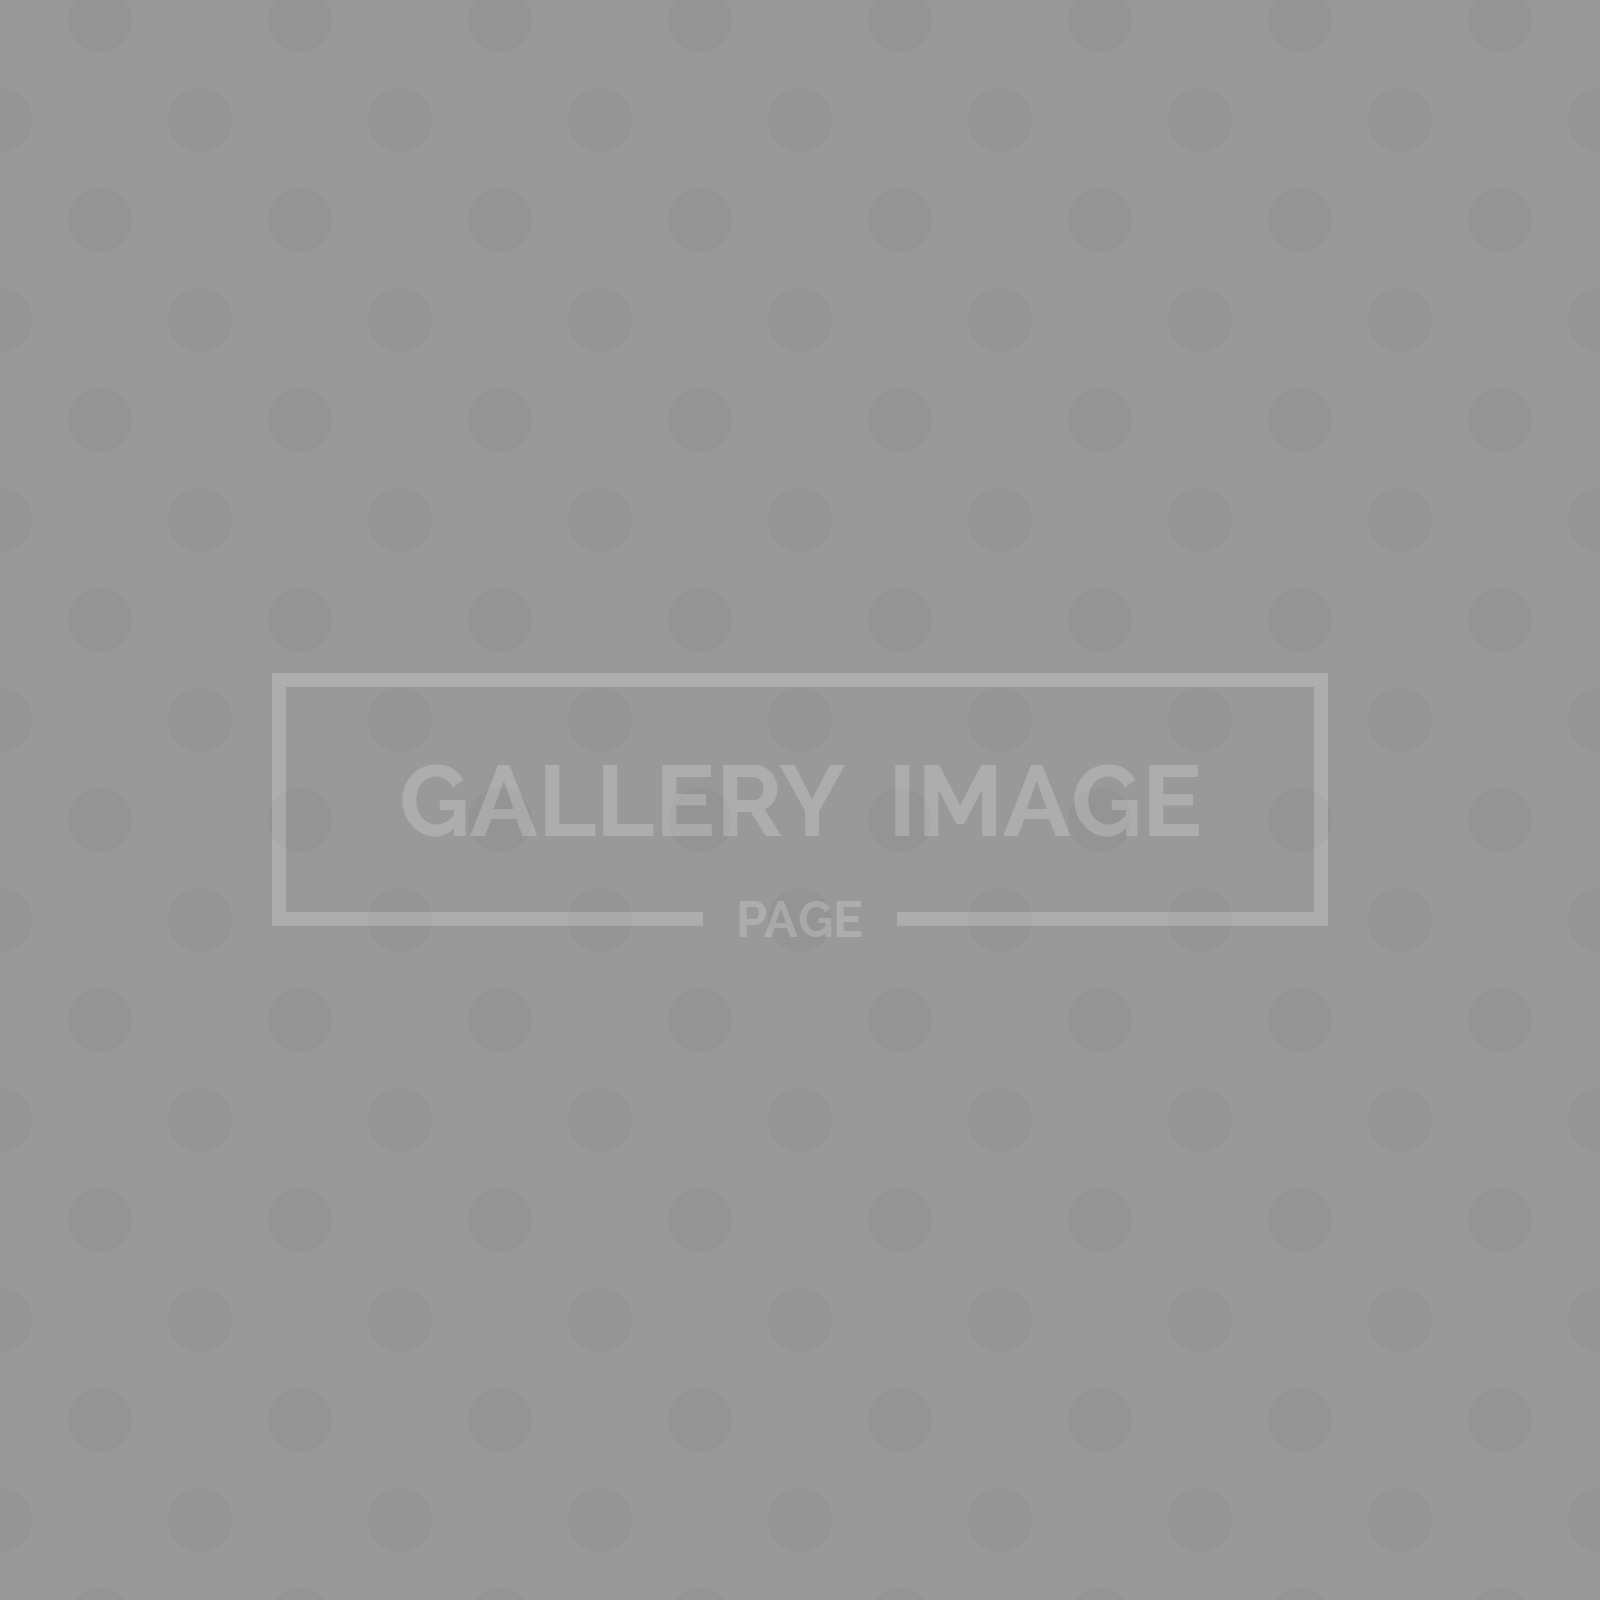 002_gallery